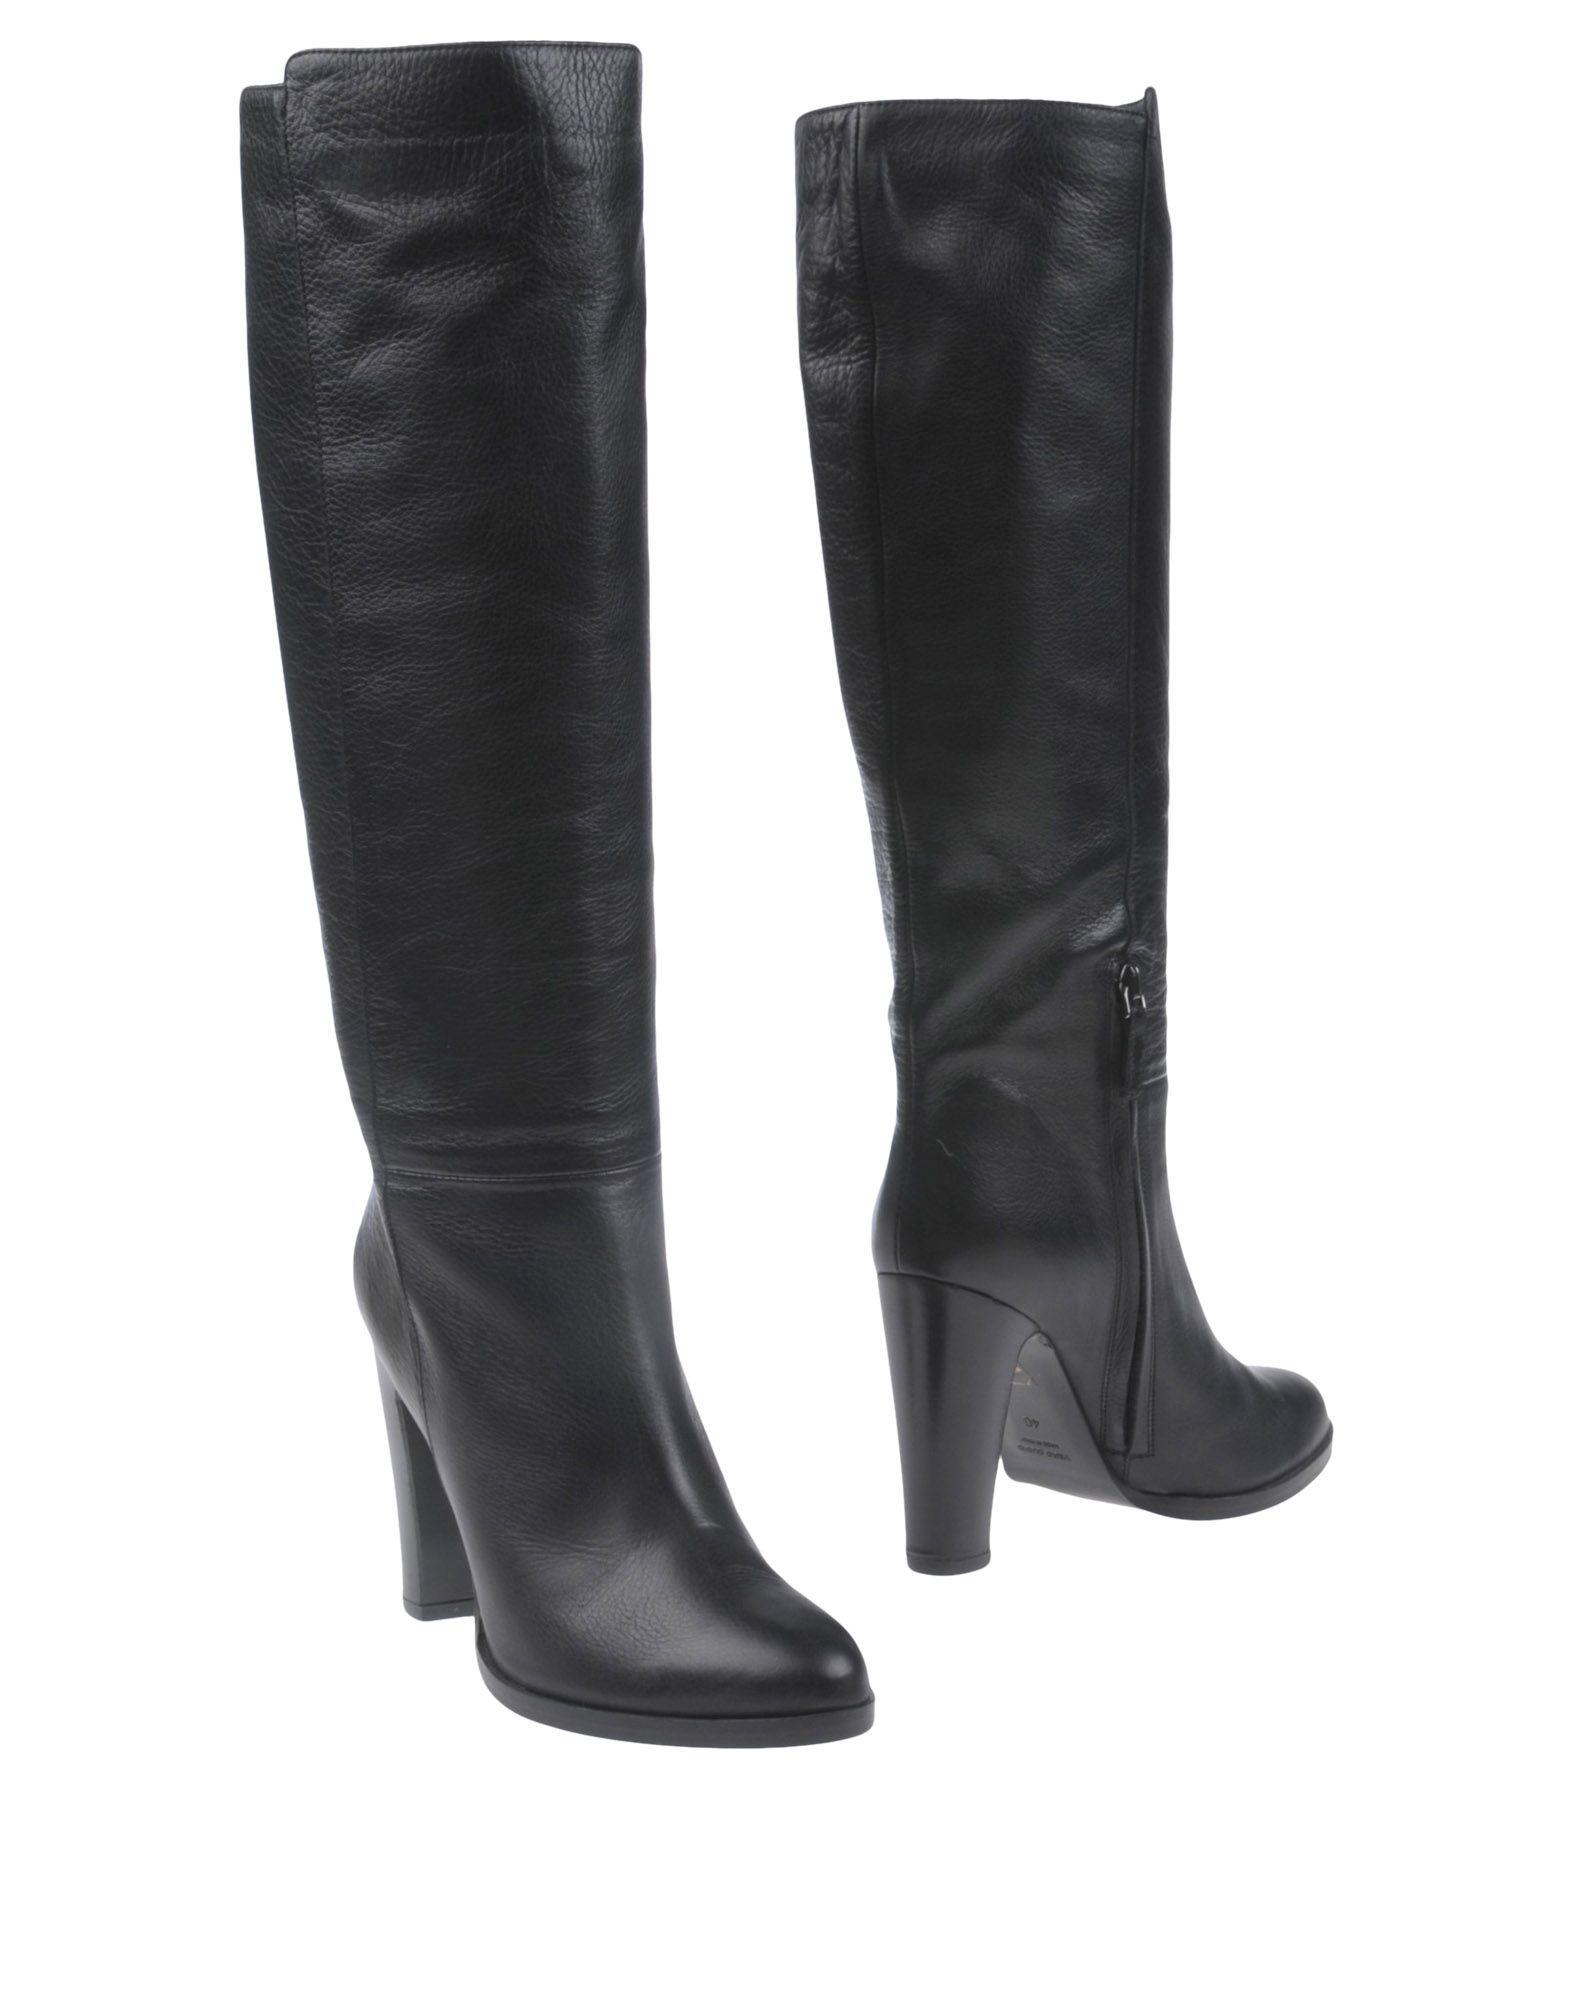 Stilvolle billige Schuhe Damen Chantal Stiefel Damen Schuhe  11281005ER 47c2d9